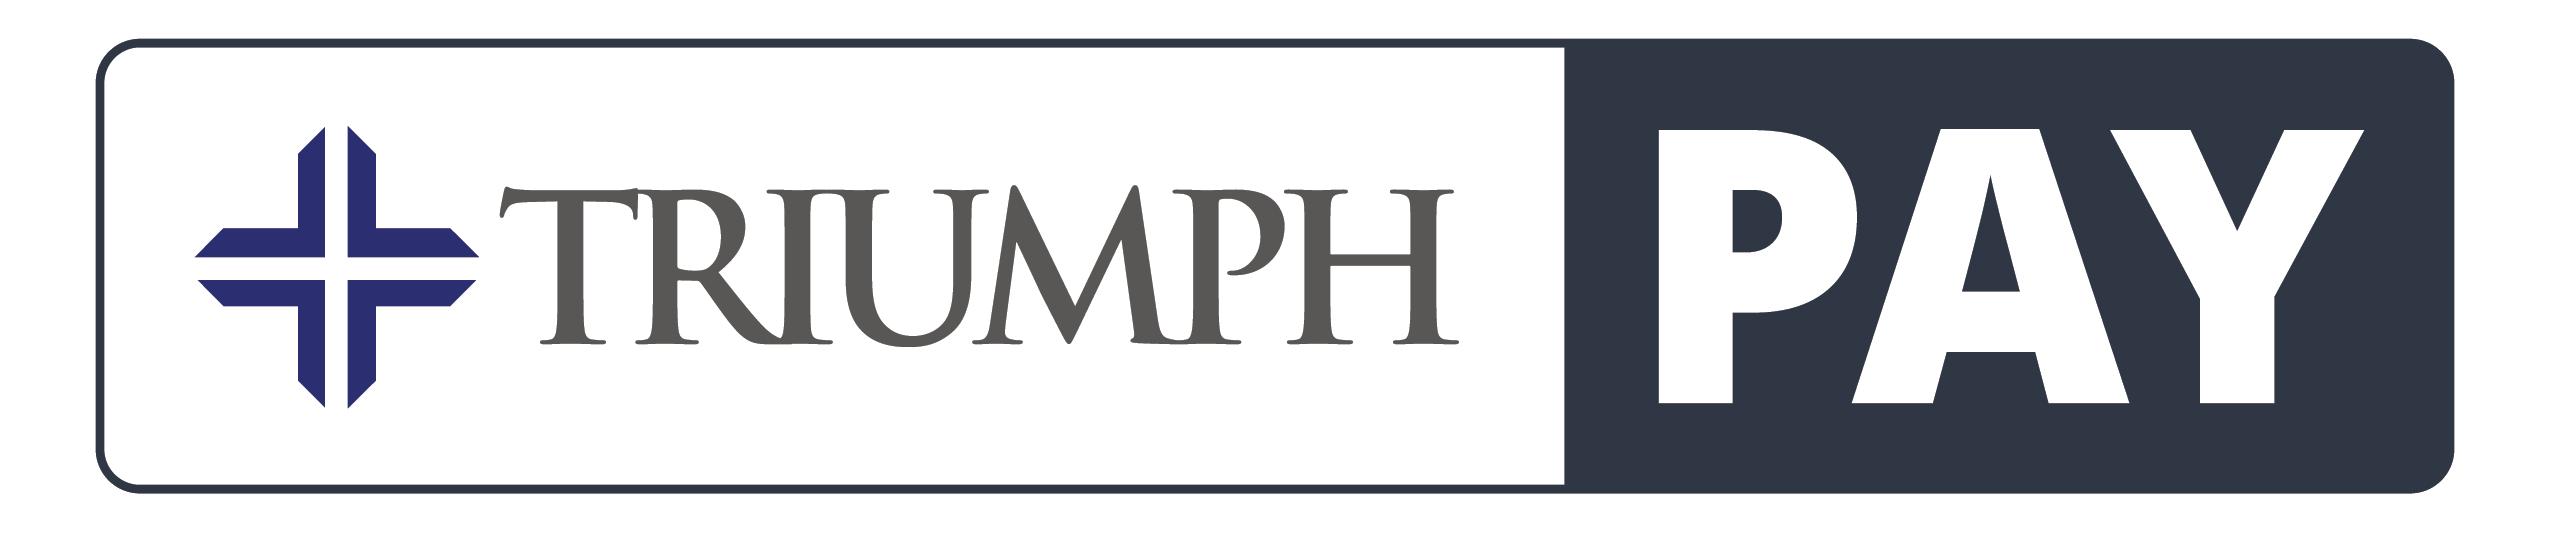 LOGO TriumphPay Logo 2 colors traditional